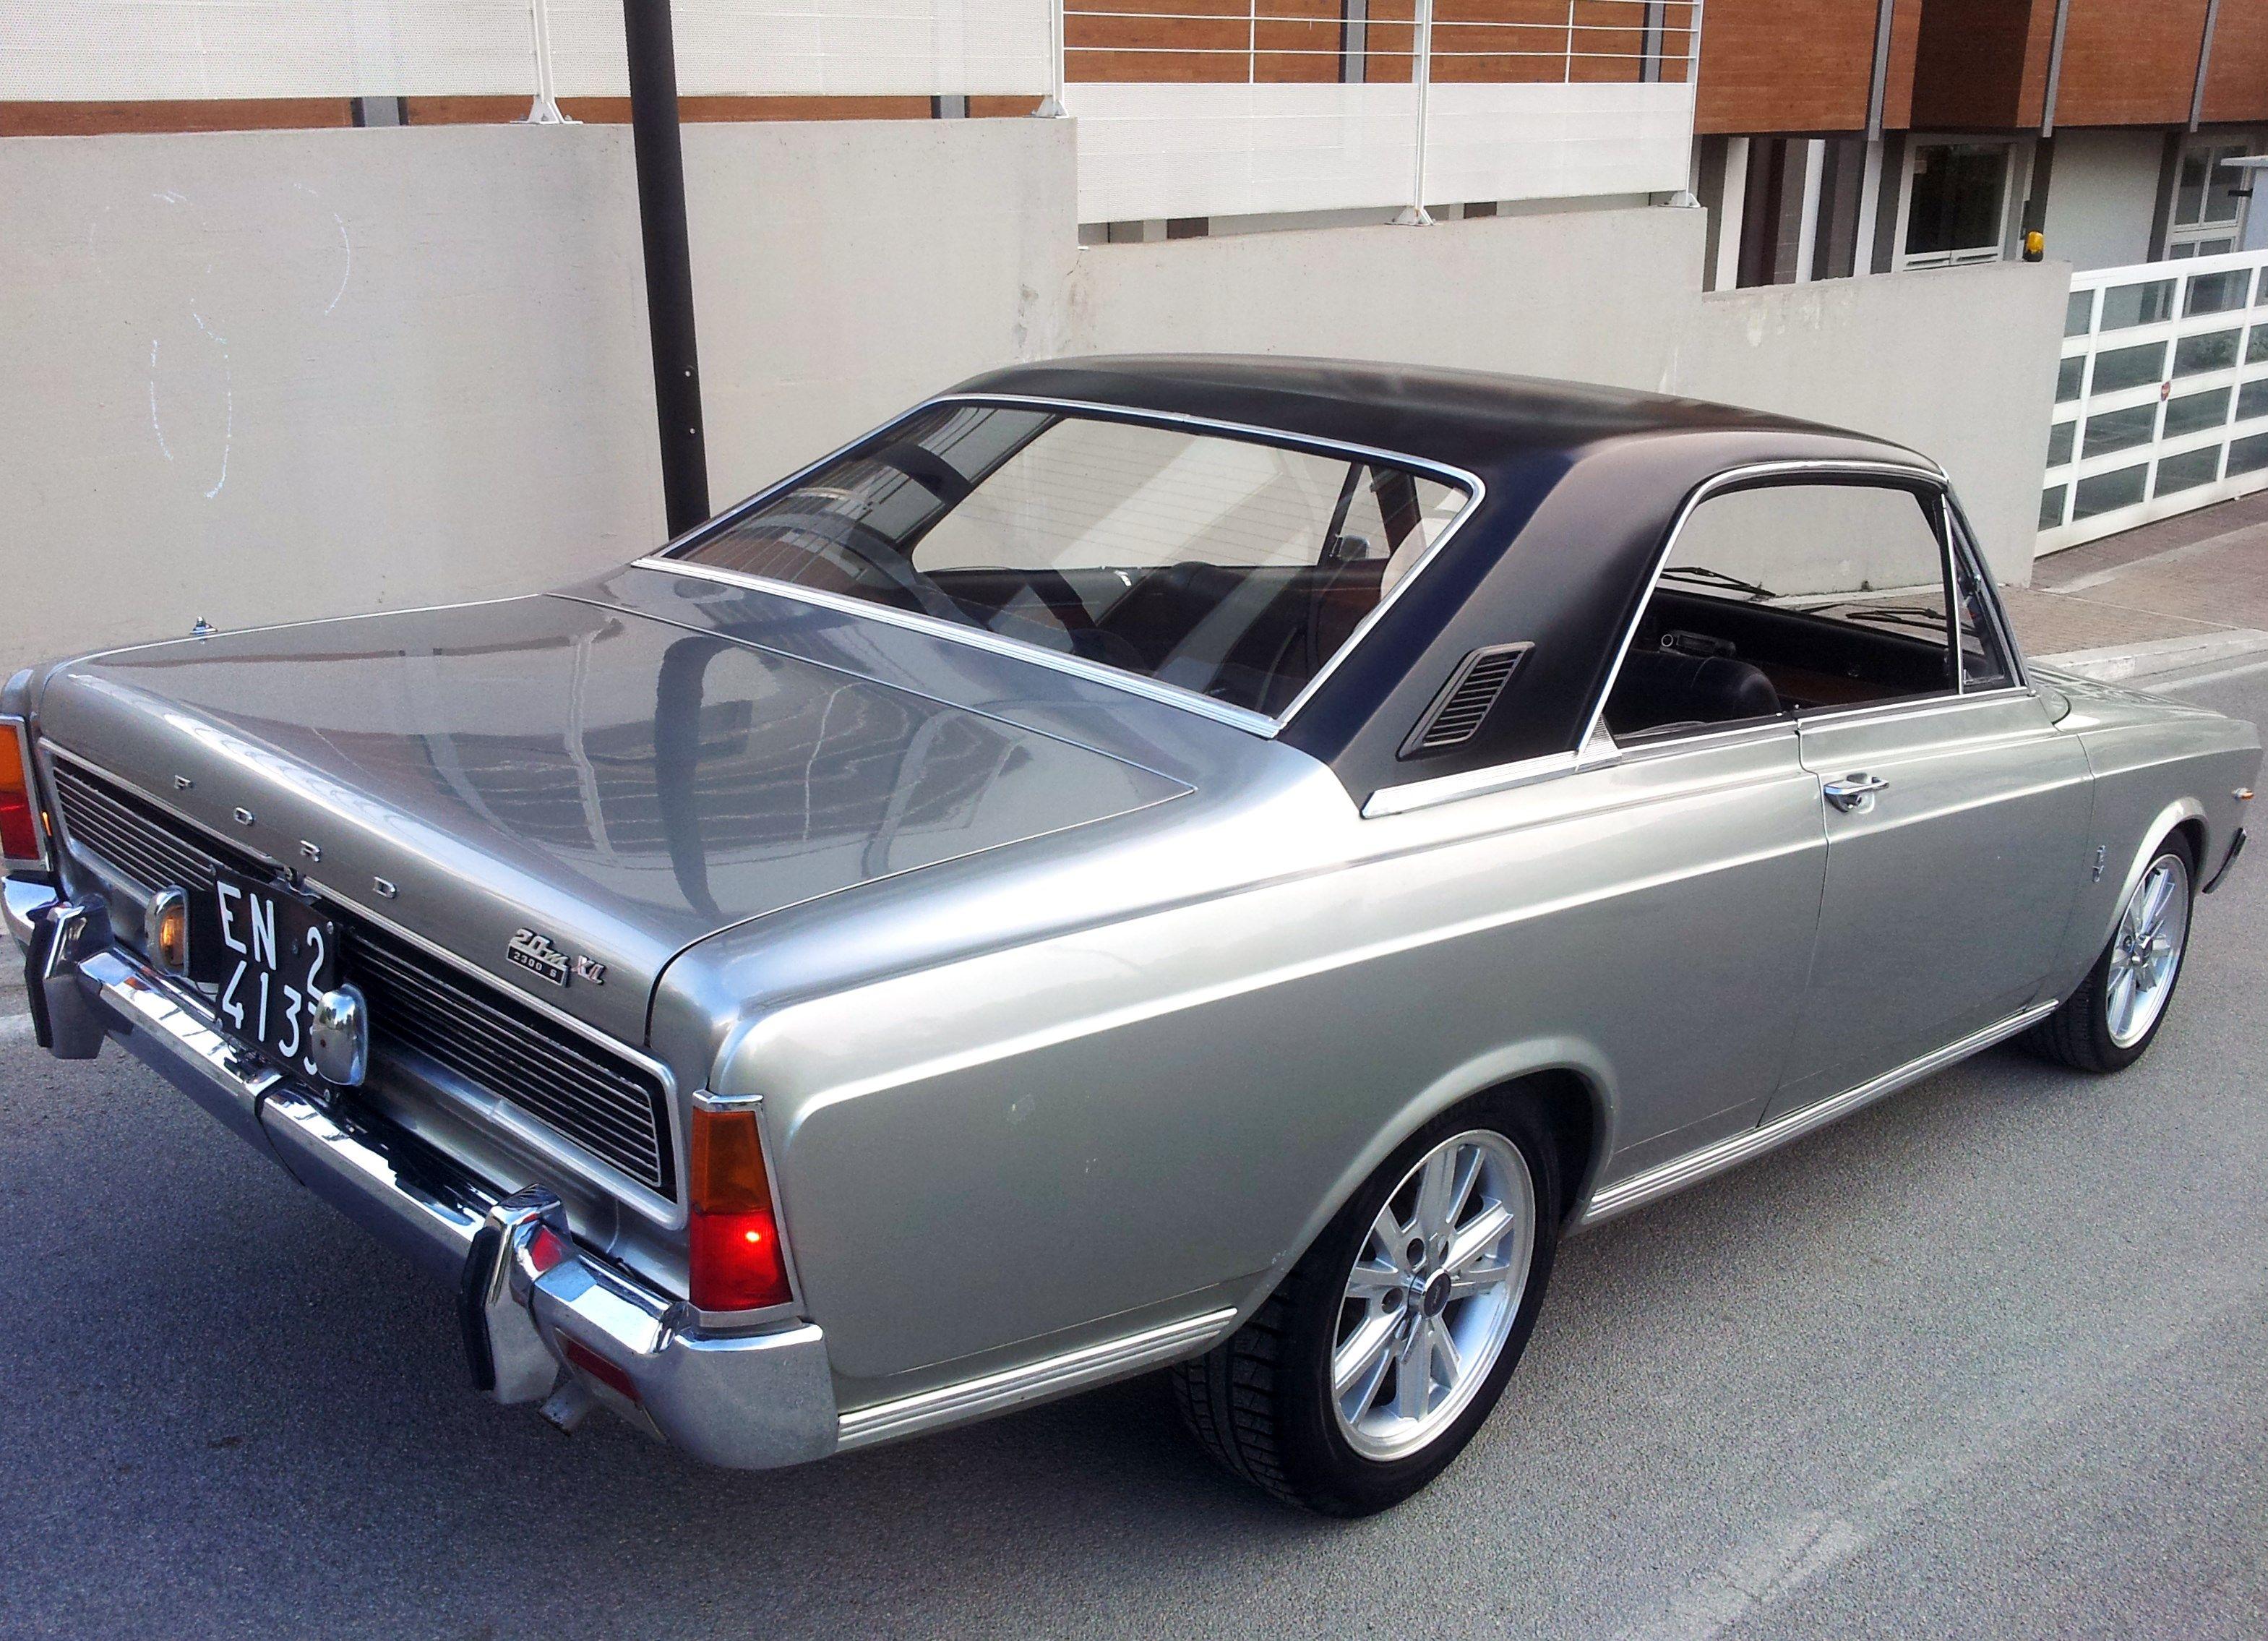 Ford taunus 2300s xl anno 1968 x info tel 3345717642